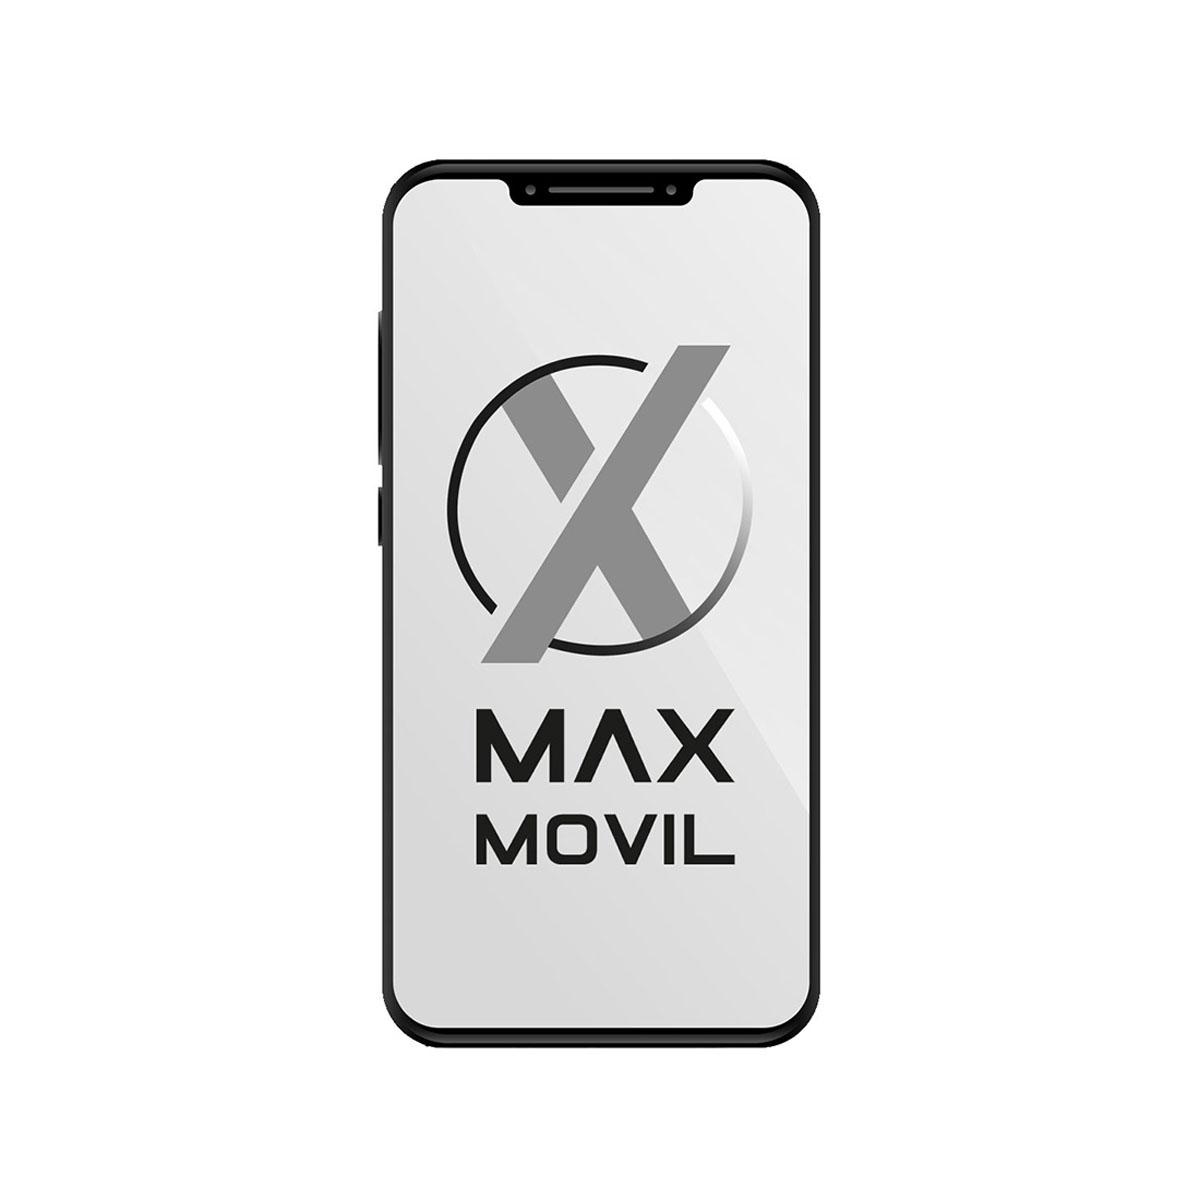 Card Panasonic  2 doorphone kx-ht82460x for kx-hts32